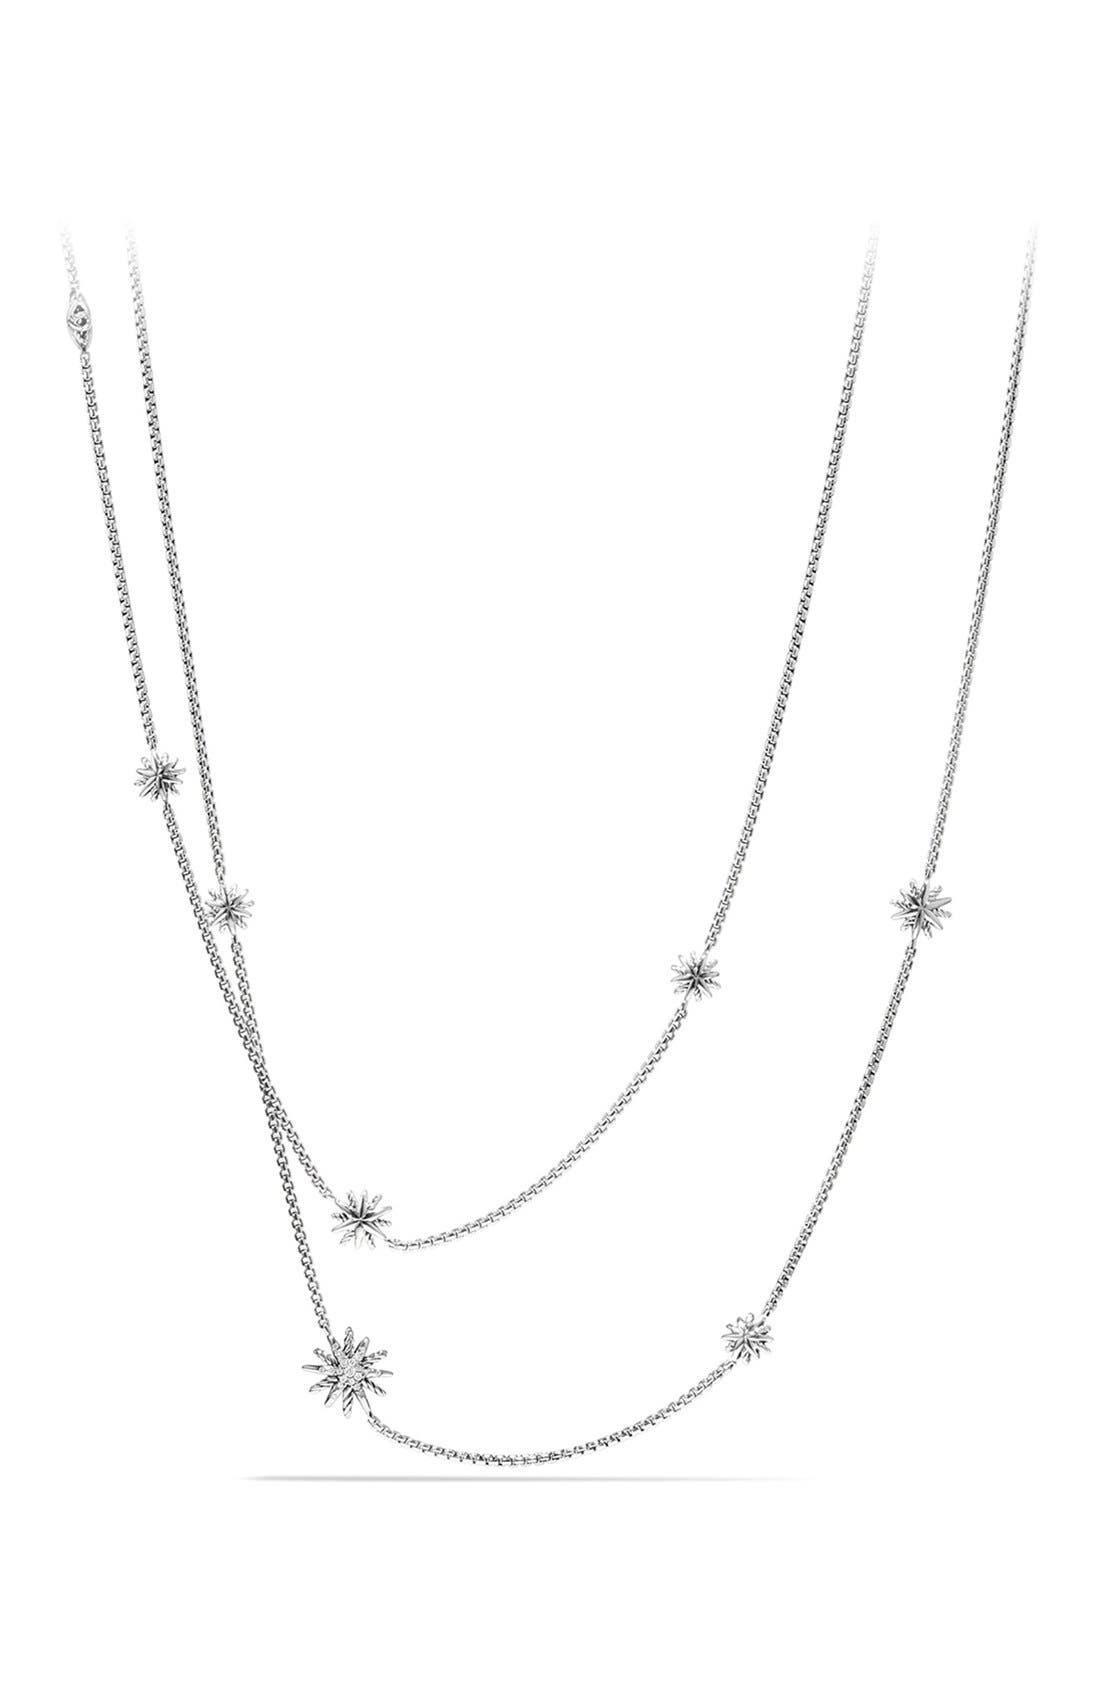 Main Image - David Yurman'Starburst' Station Necklace with Diamonds